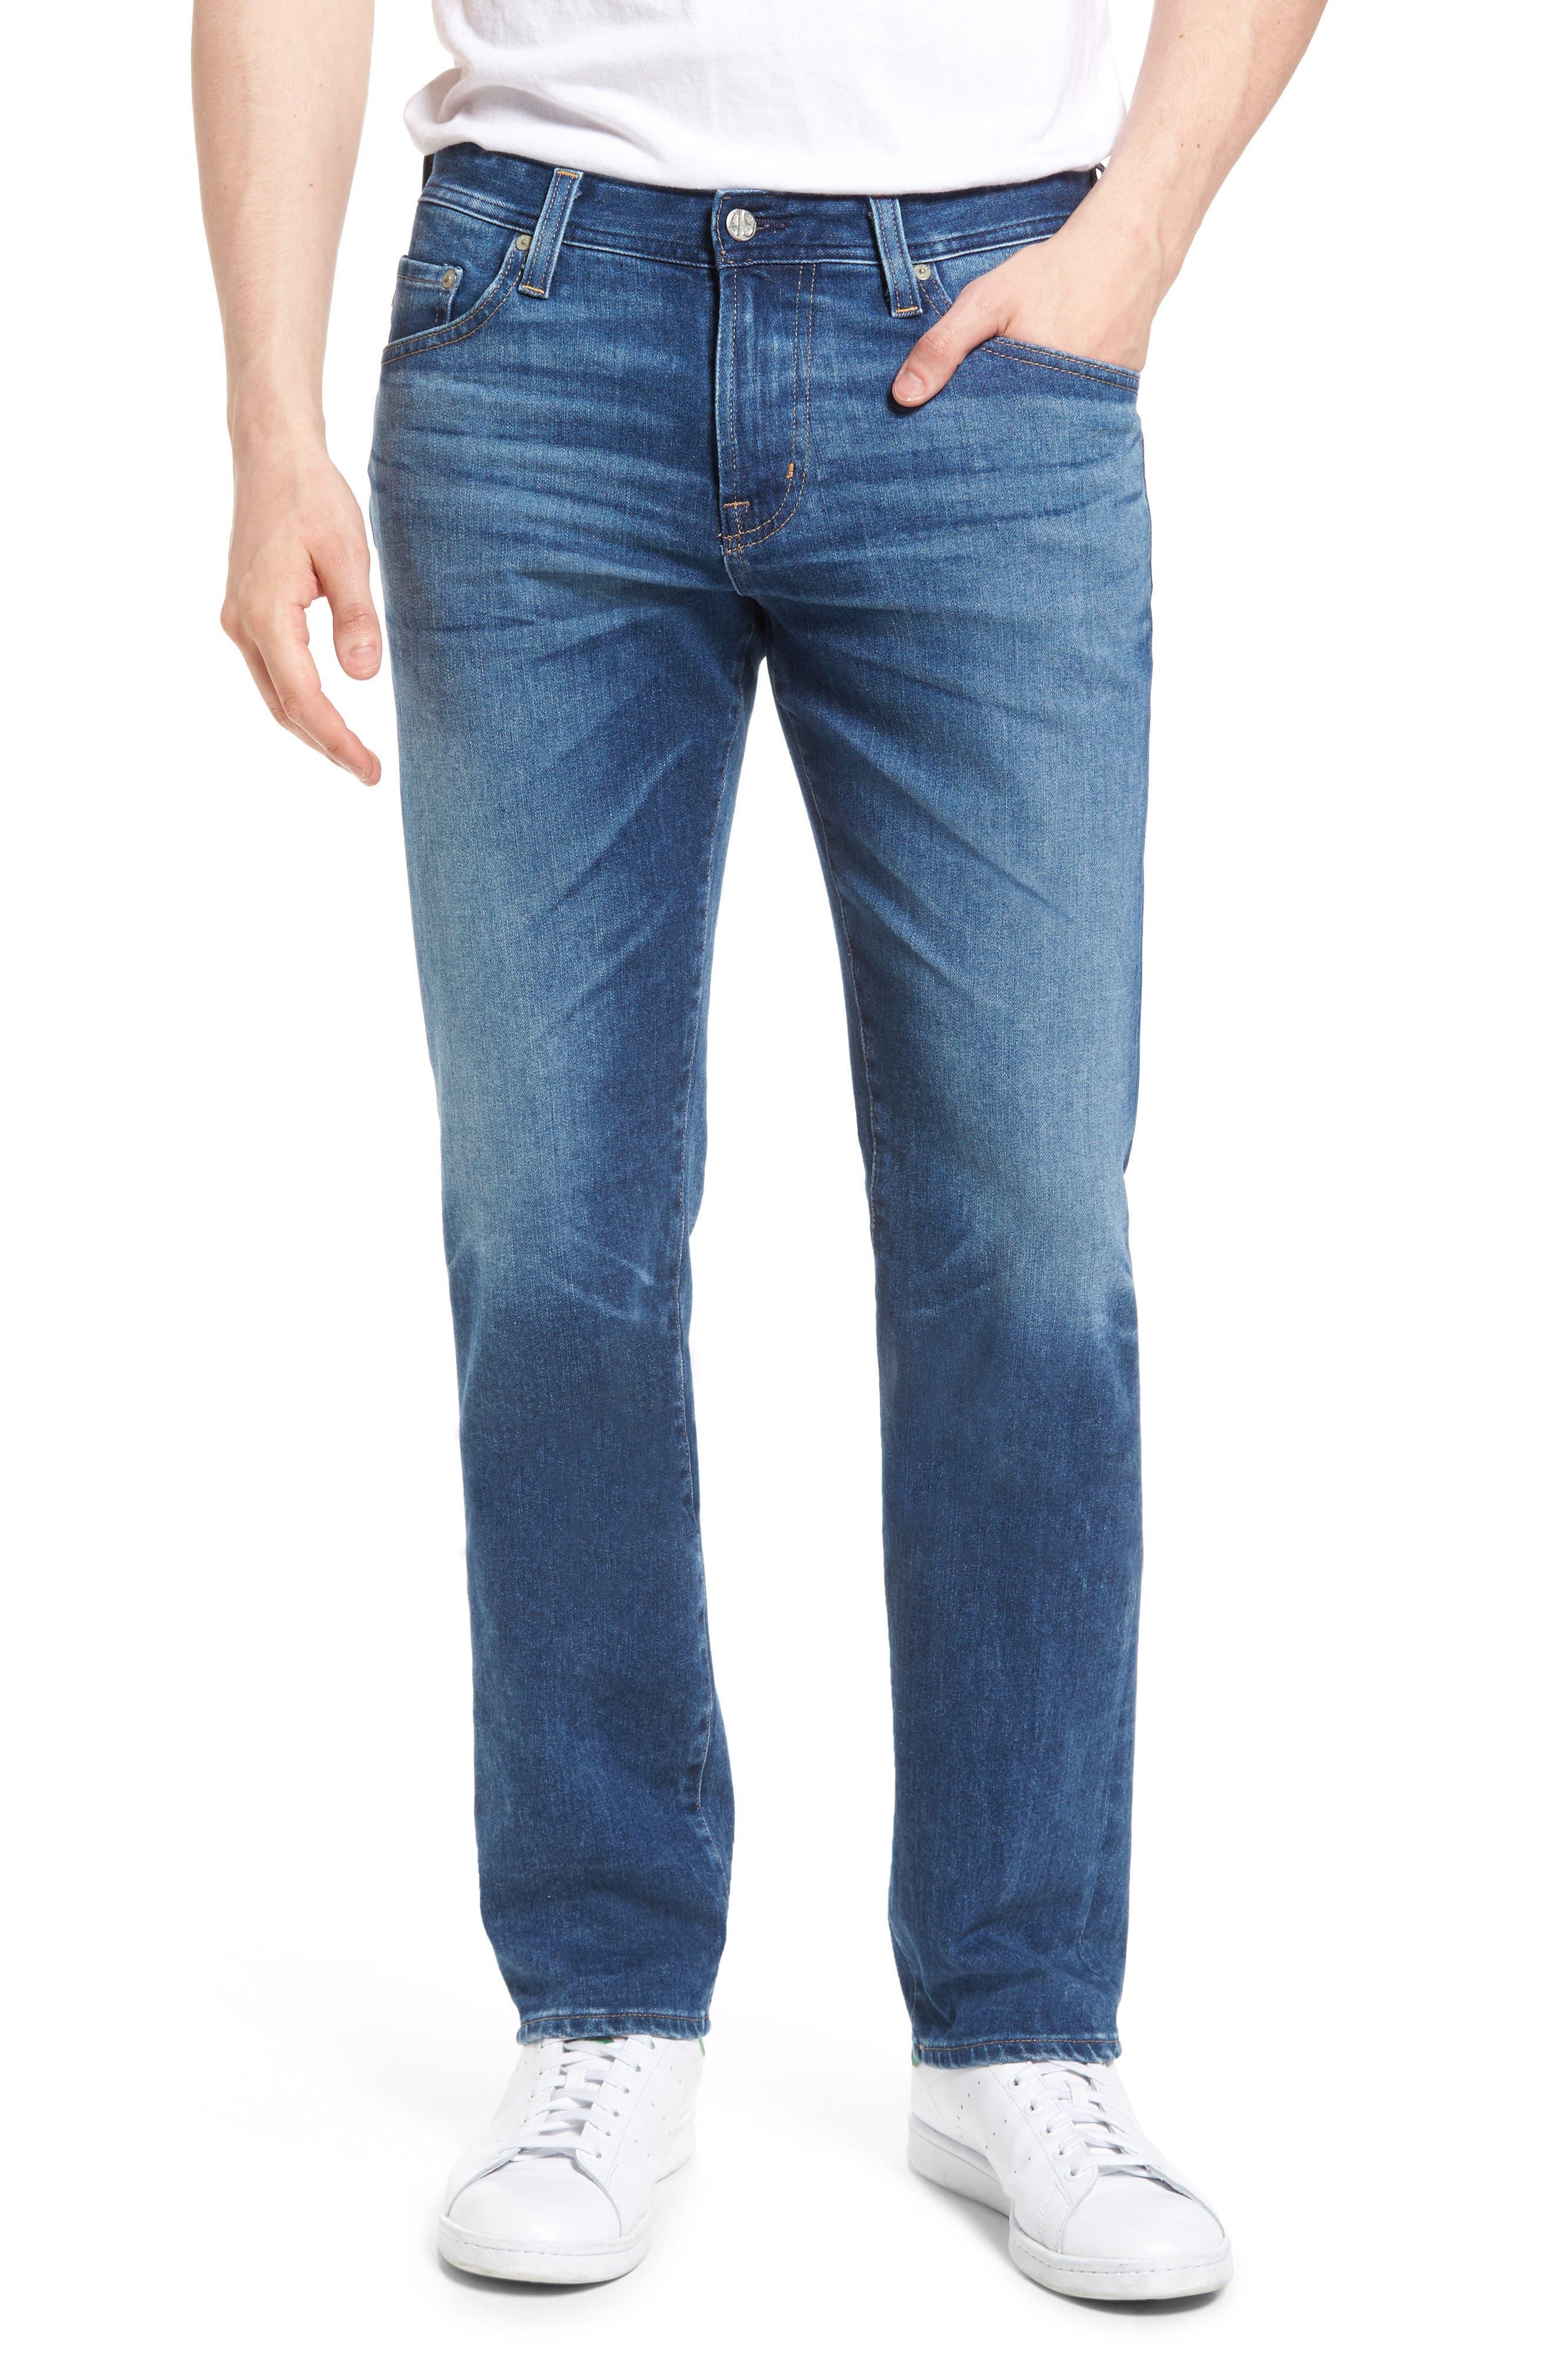 Graduate Slim Straight Leg Jeans,                         Main,                         color, 450